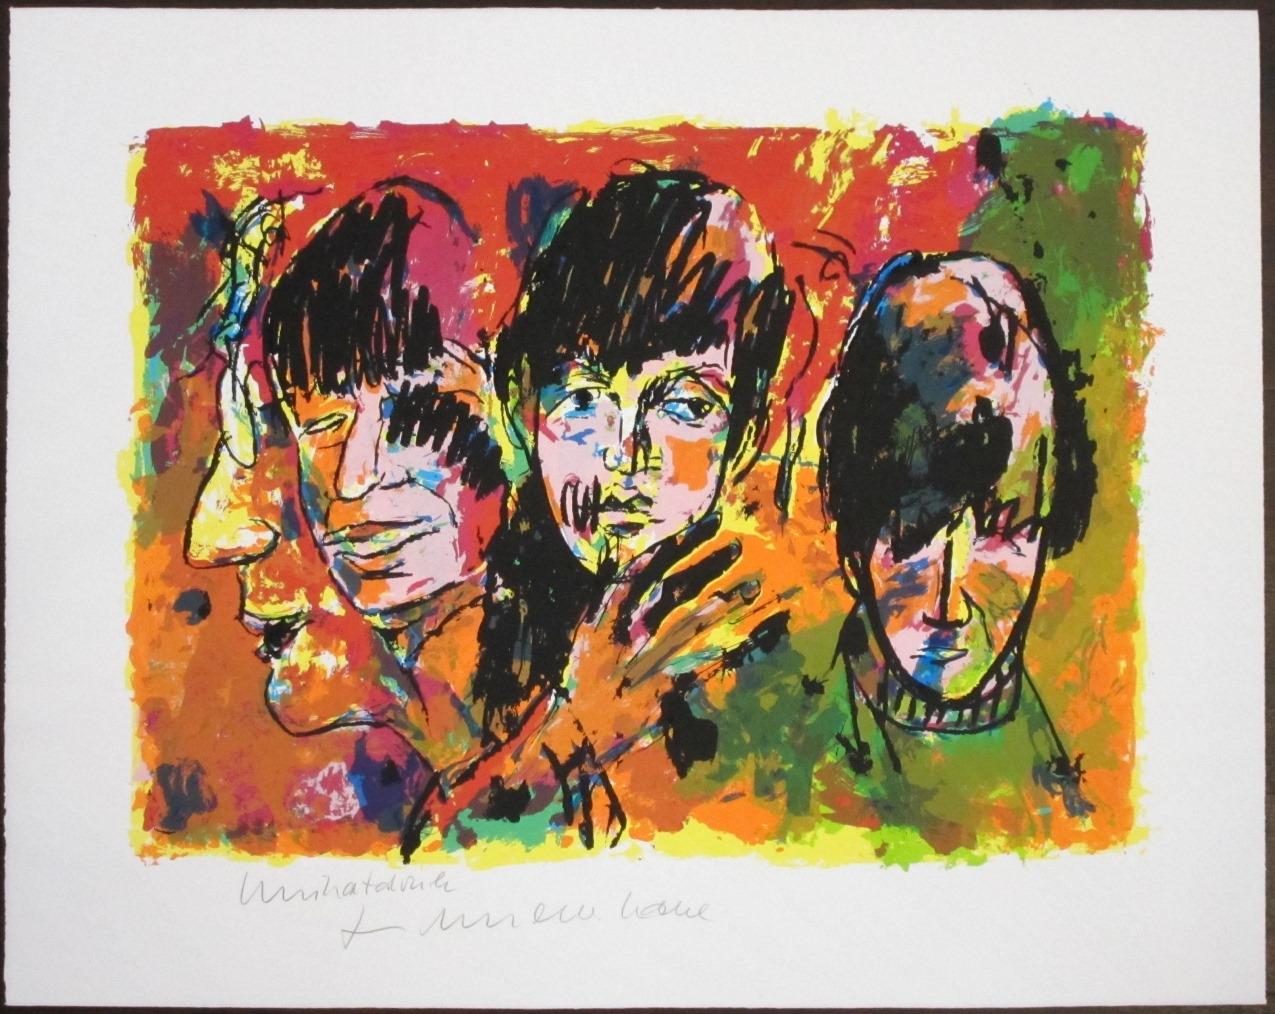 The Beatles - Unikatdruck - Variante rot/grün/orange